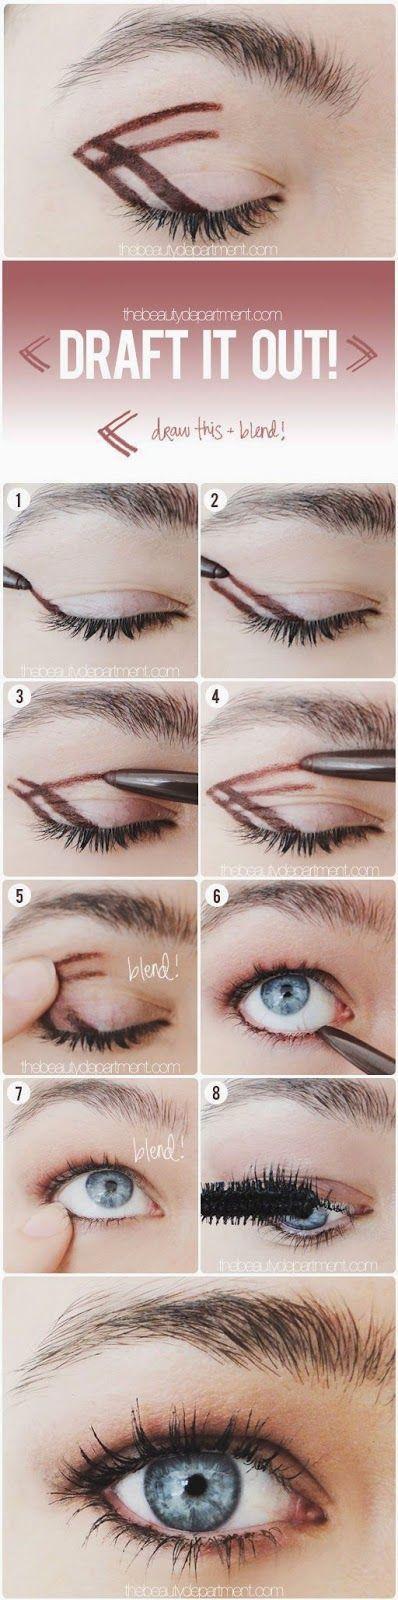 زفاف - Beauty - Make Up